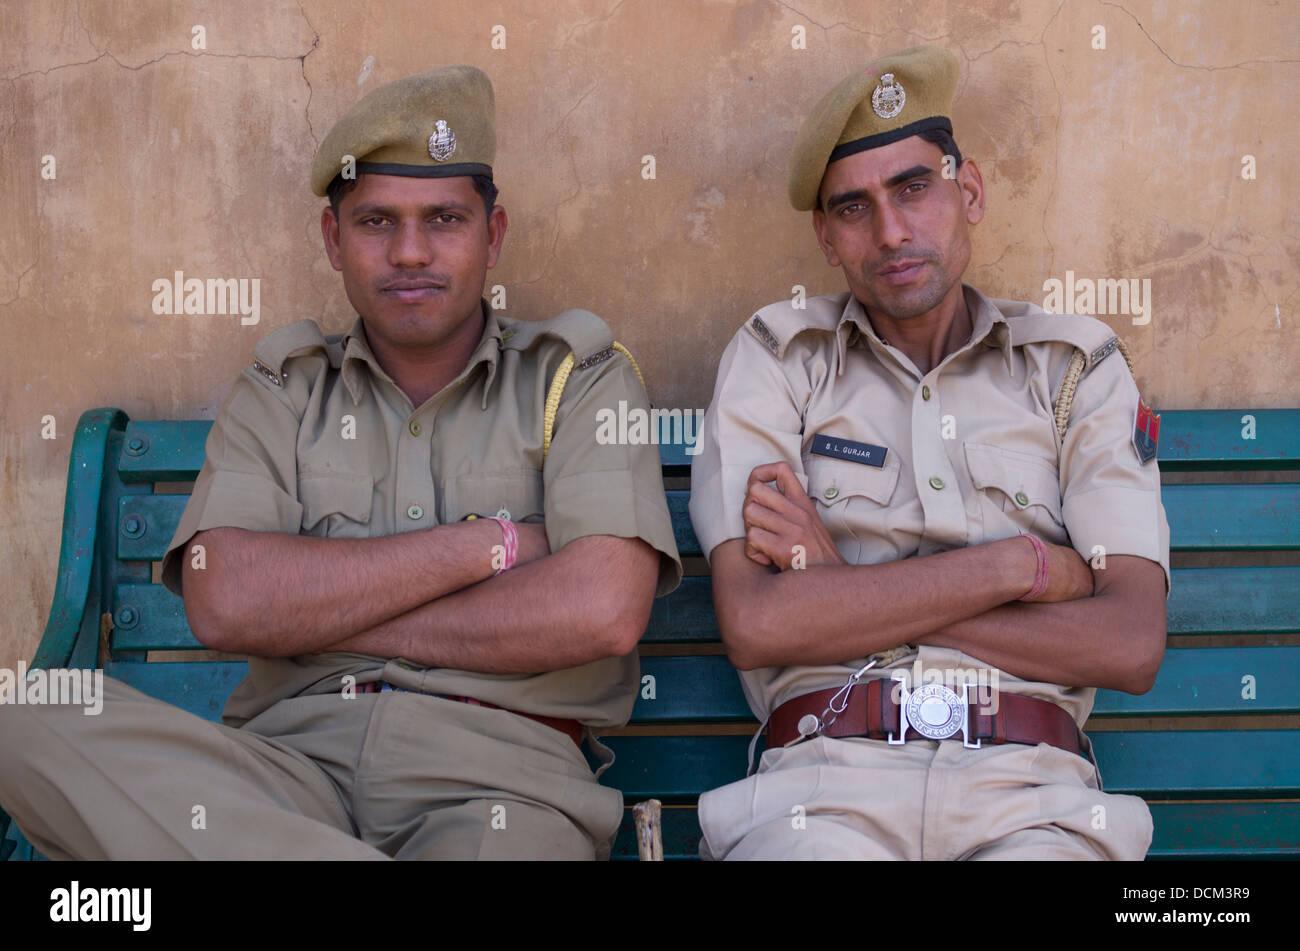 Indian security guards at Amber ( Amer ) Fort / Palace - Jaipur, Rajasthan, India - Stock Image